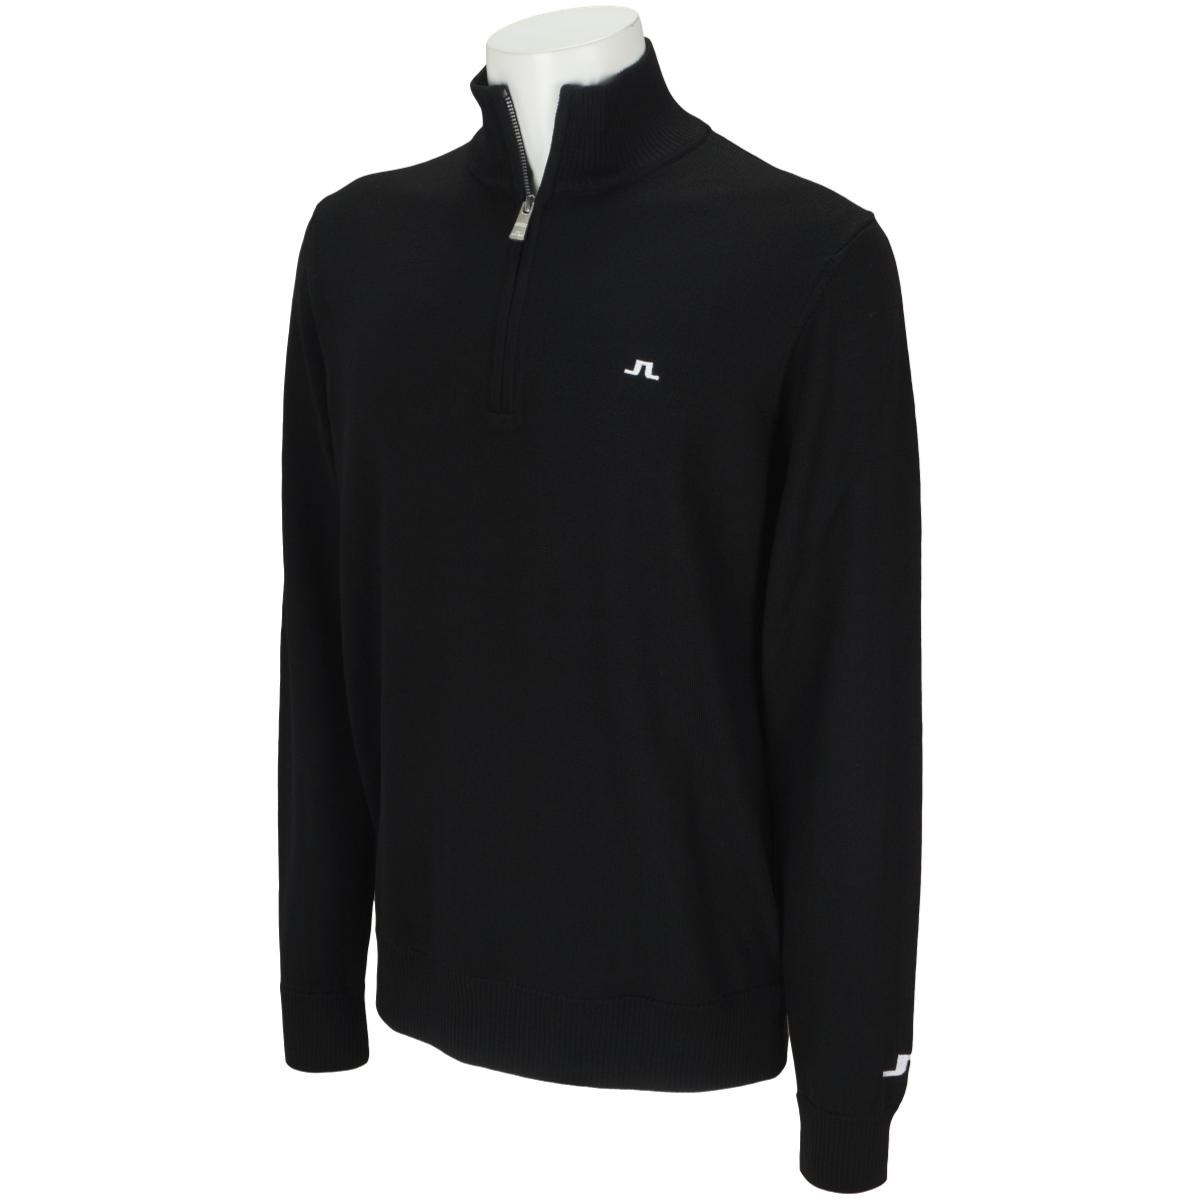 J.リンドバーグ Kian Tour Merino セーター